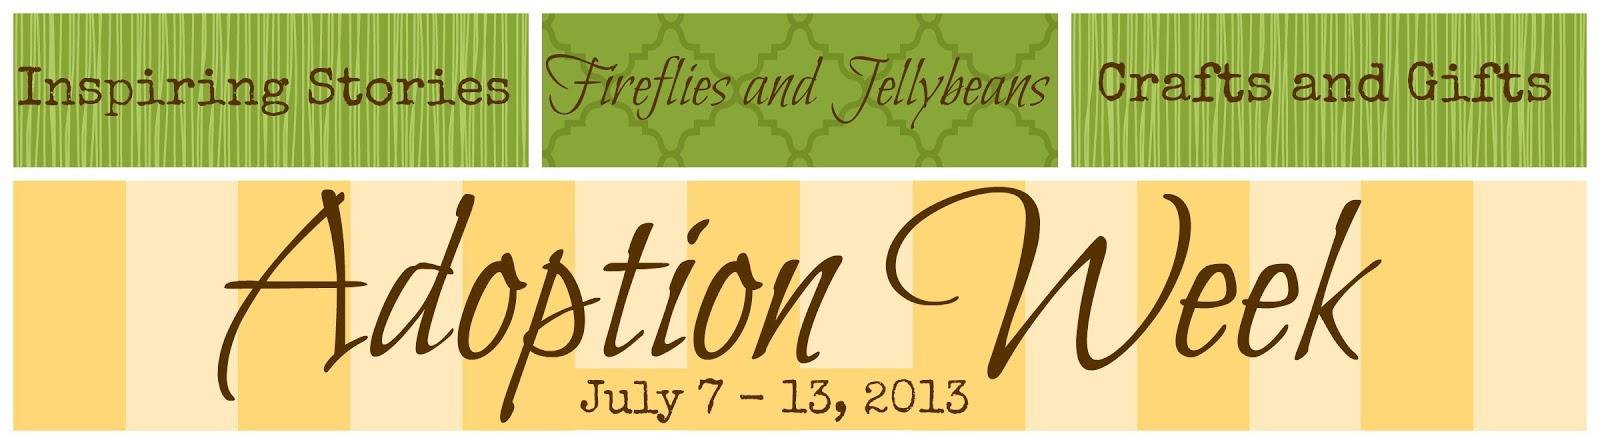 Fireflies And Jellybeans Adoption Week One Way We Celebrate Adoption Gotcha Day